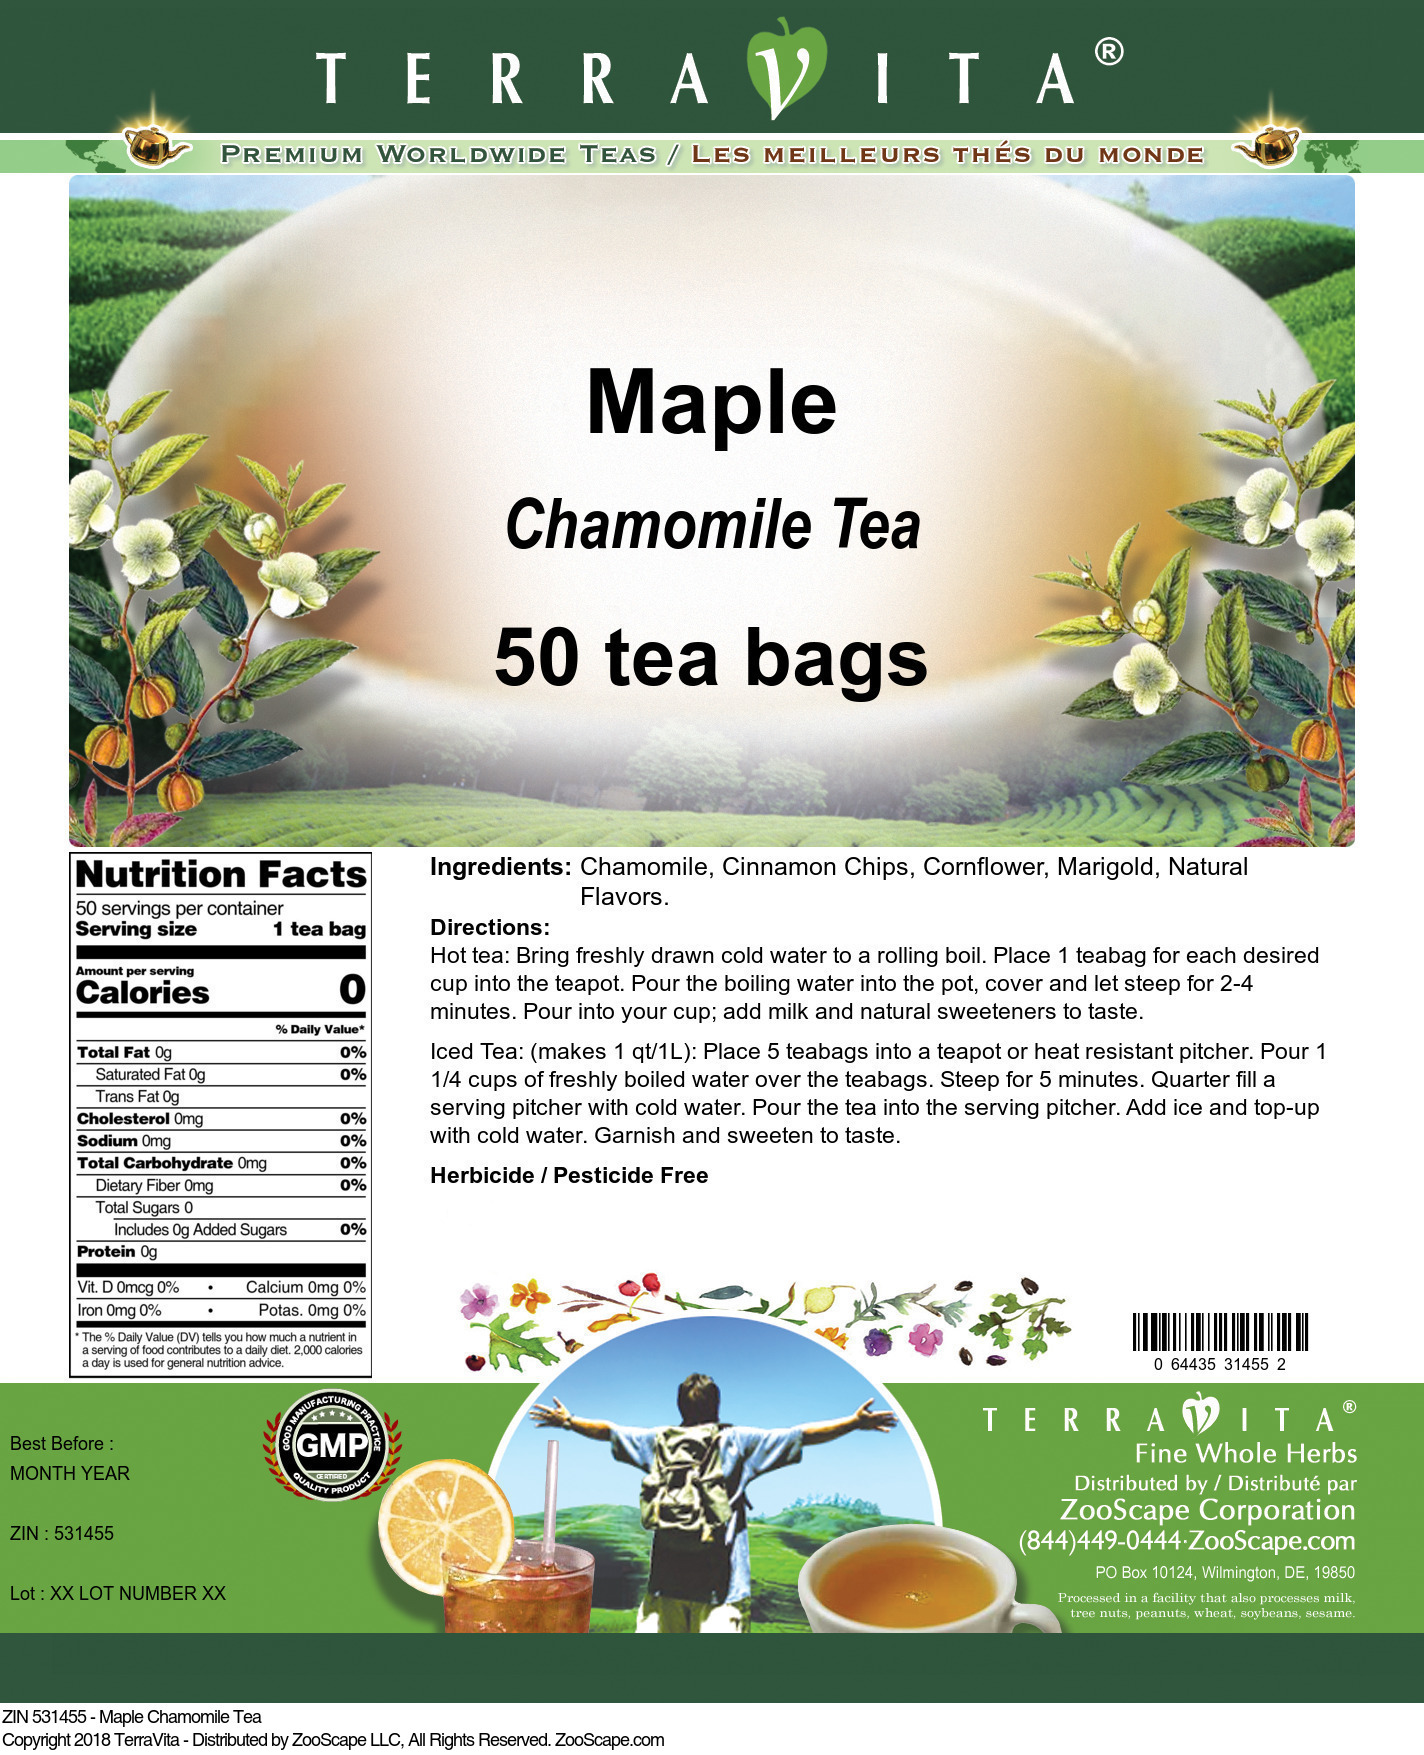 Maple Chamomile Tea